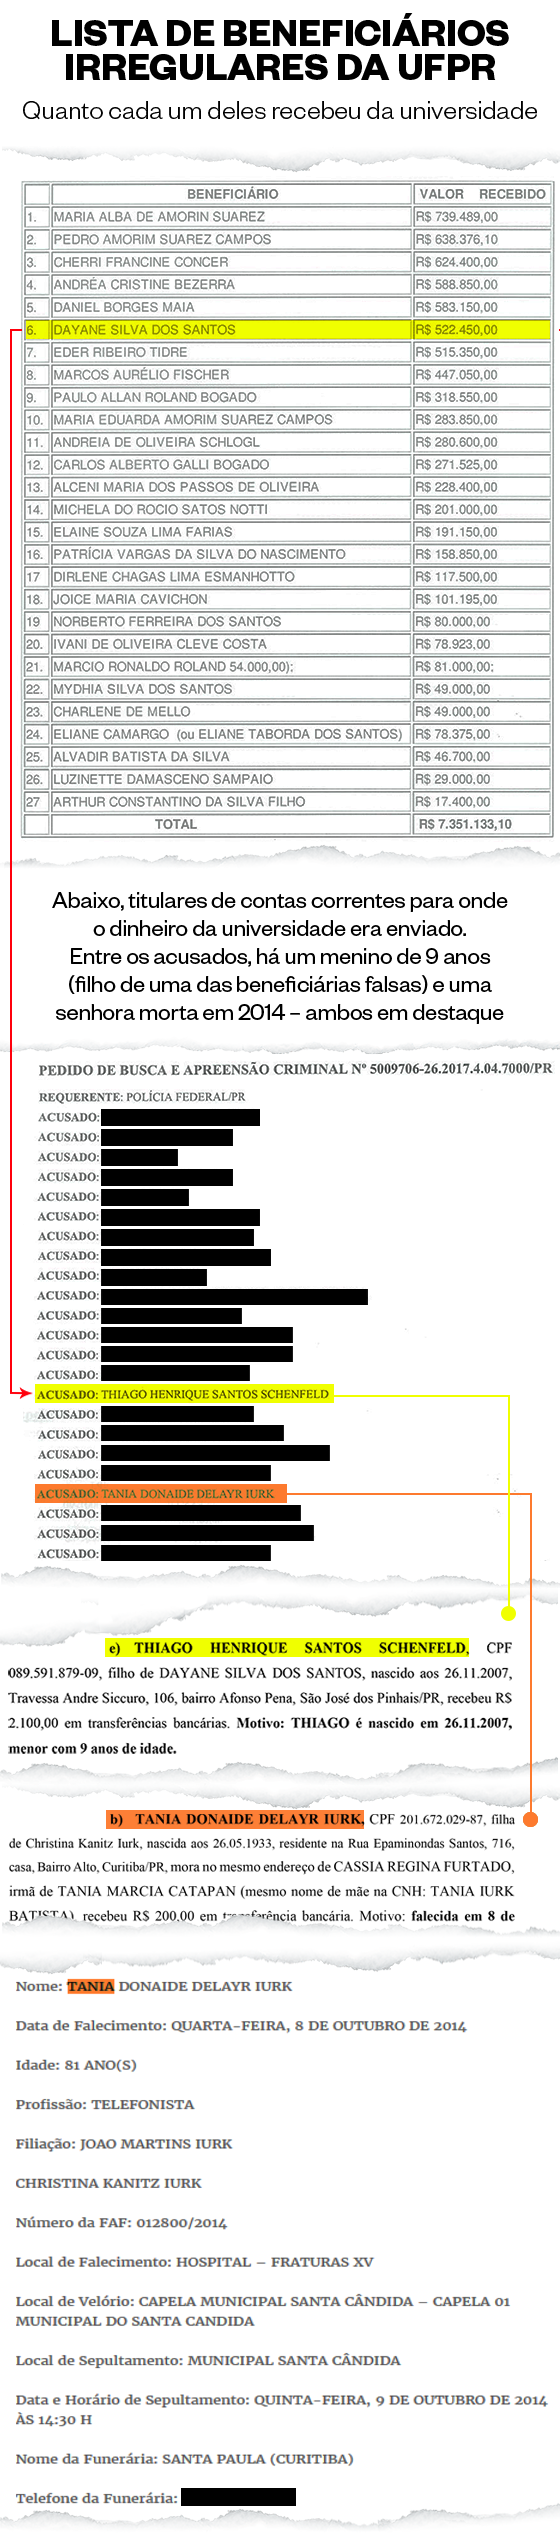 Lista de beneficiários irregulares da UFPR. Nenhum deles possui currículo lattes (Foto: Inforgrafia Época / Renato Tanigawa)